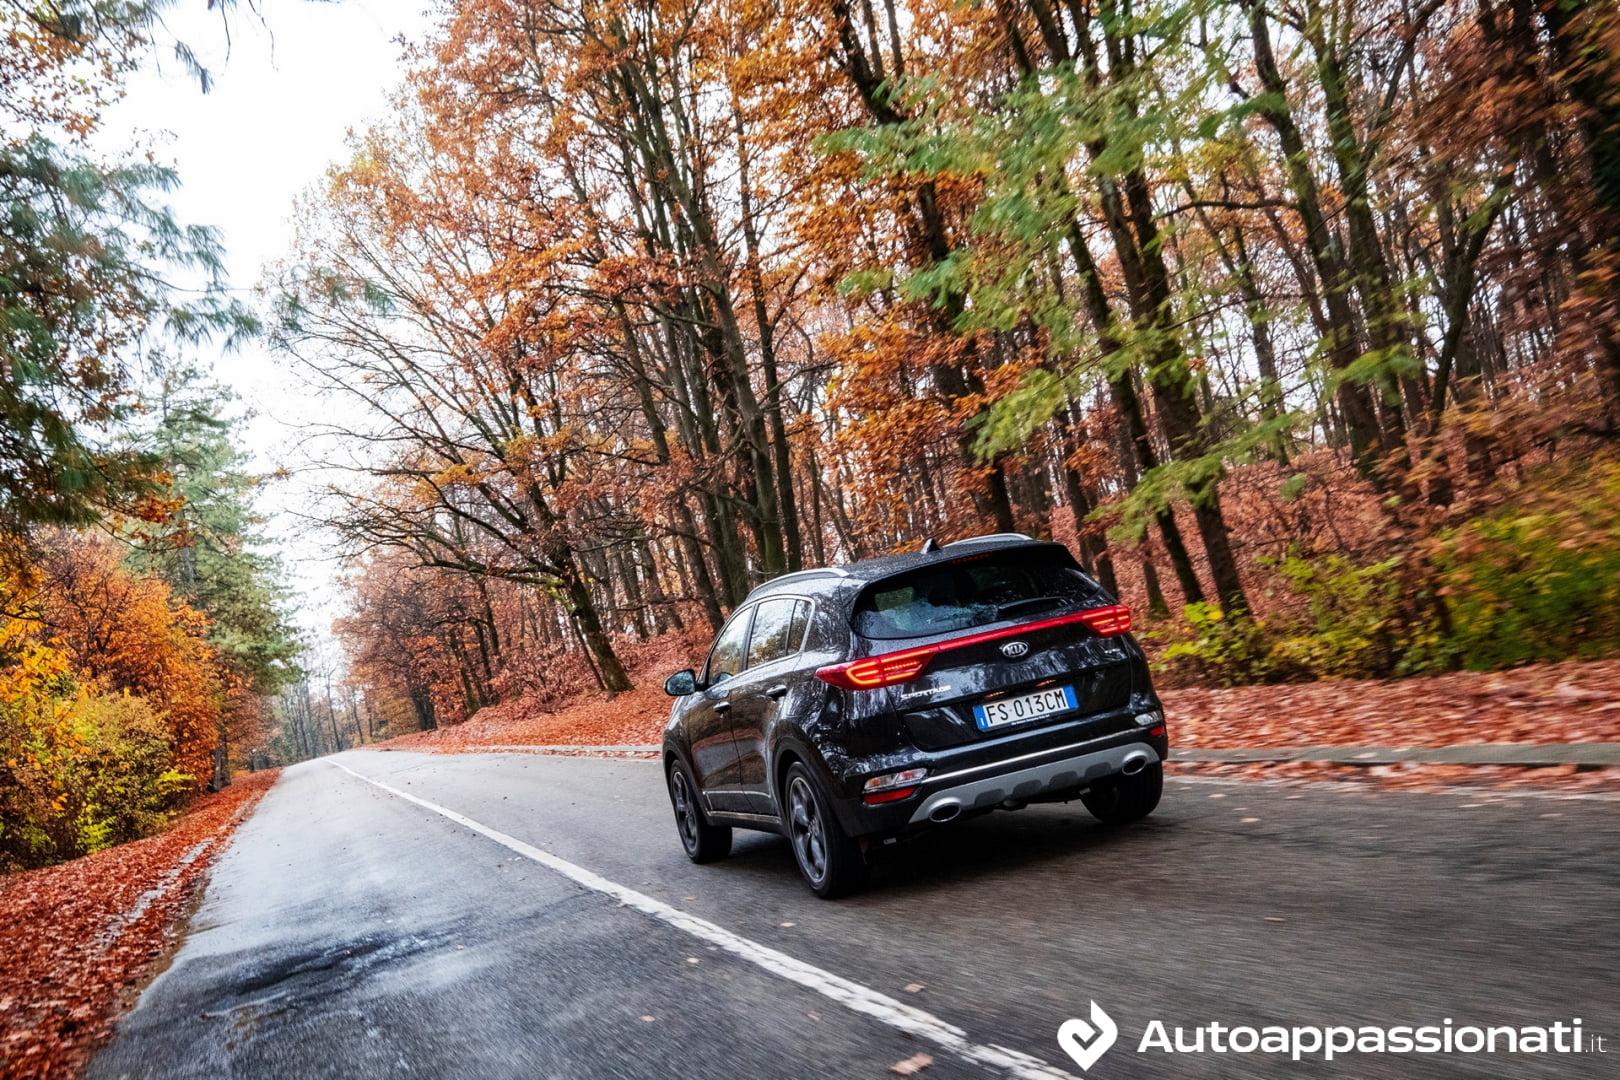 Kia Sportage 2.0 CRDi Mild Hybrid